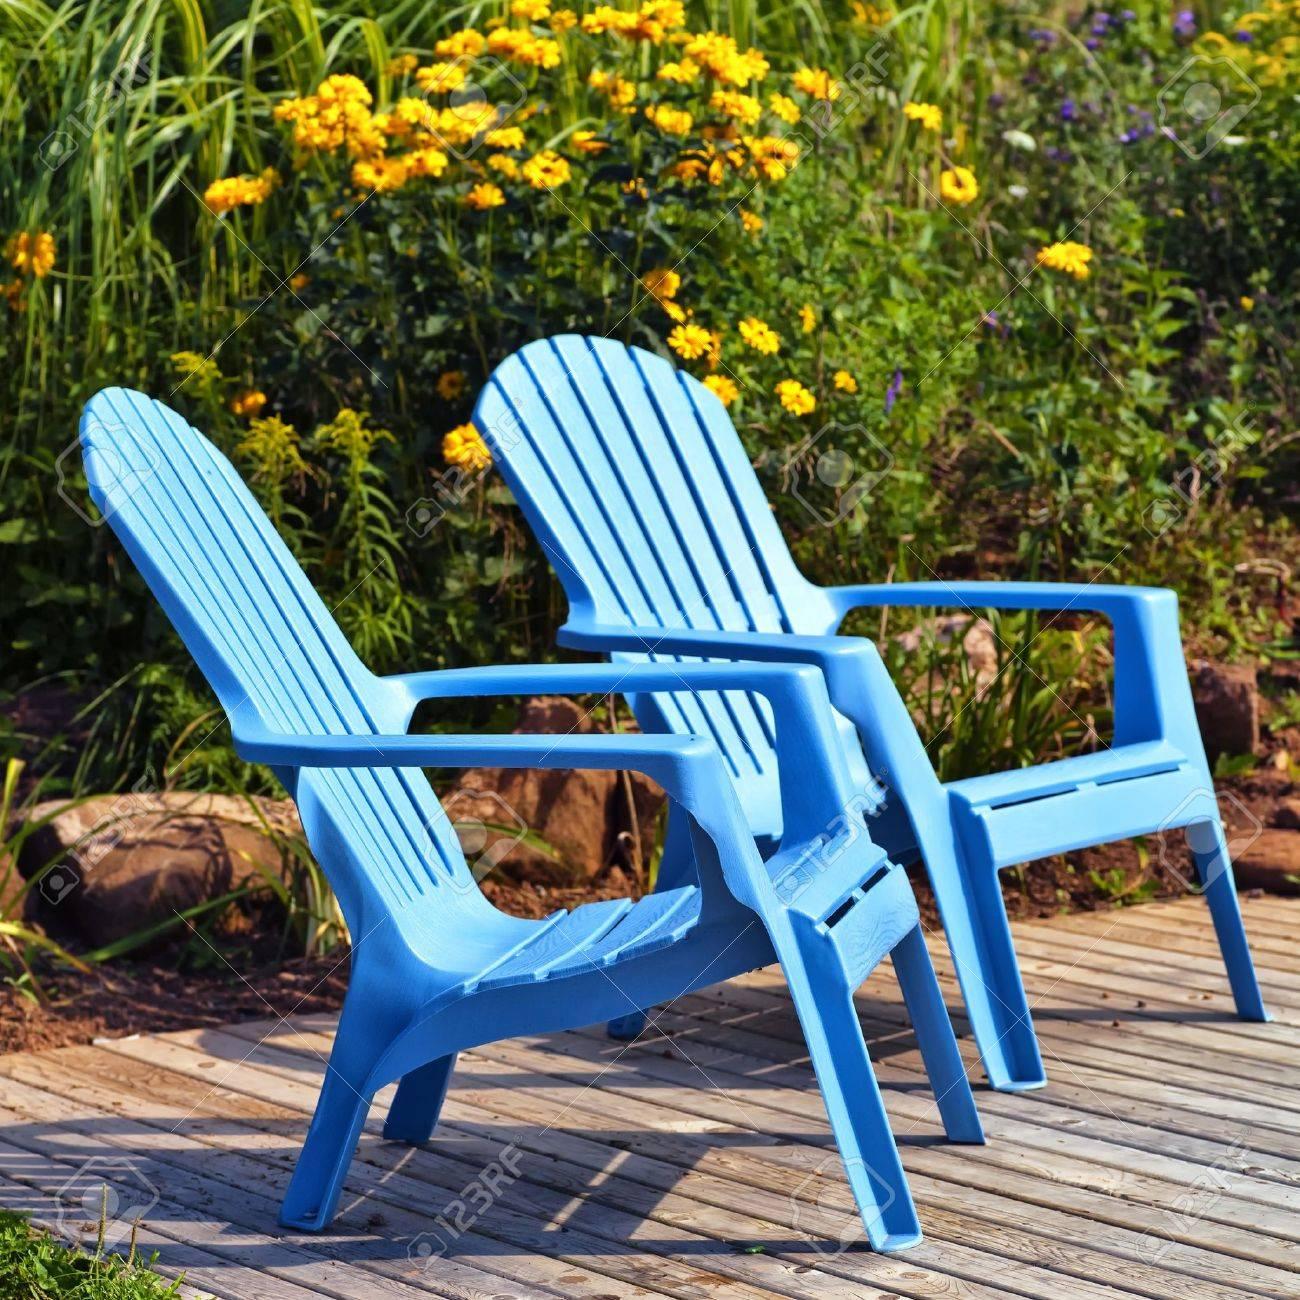 Asombroso Muebles De Plástico Azul Sillas Adirondack Motivo ...